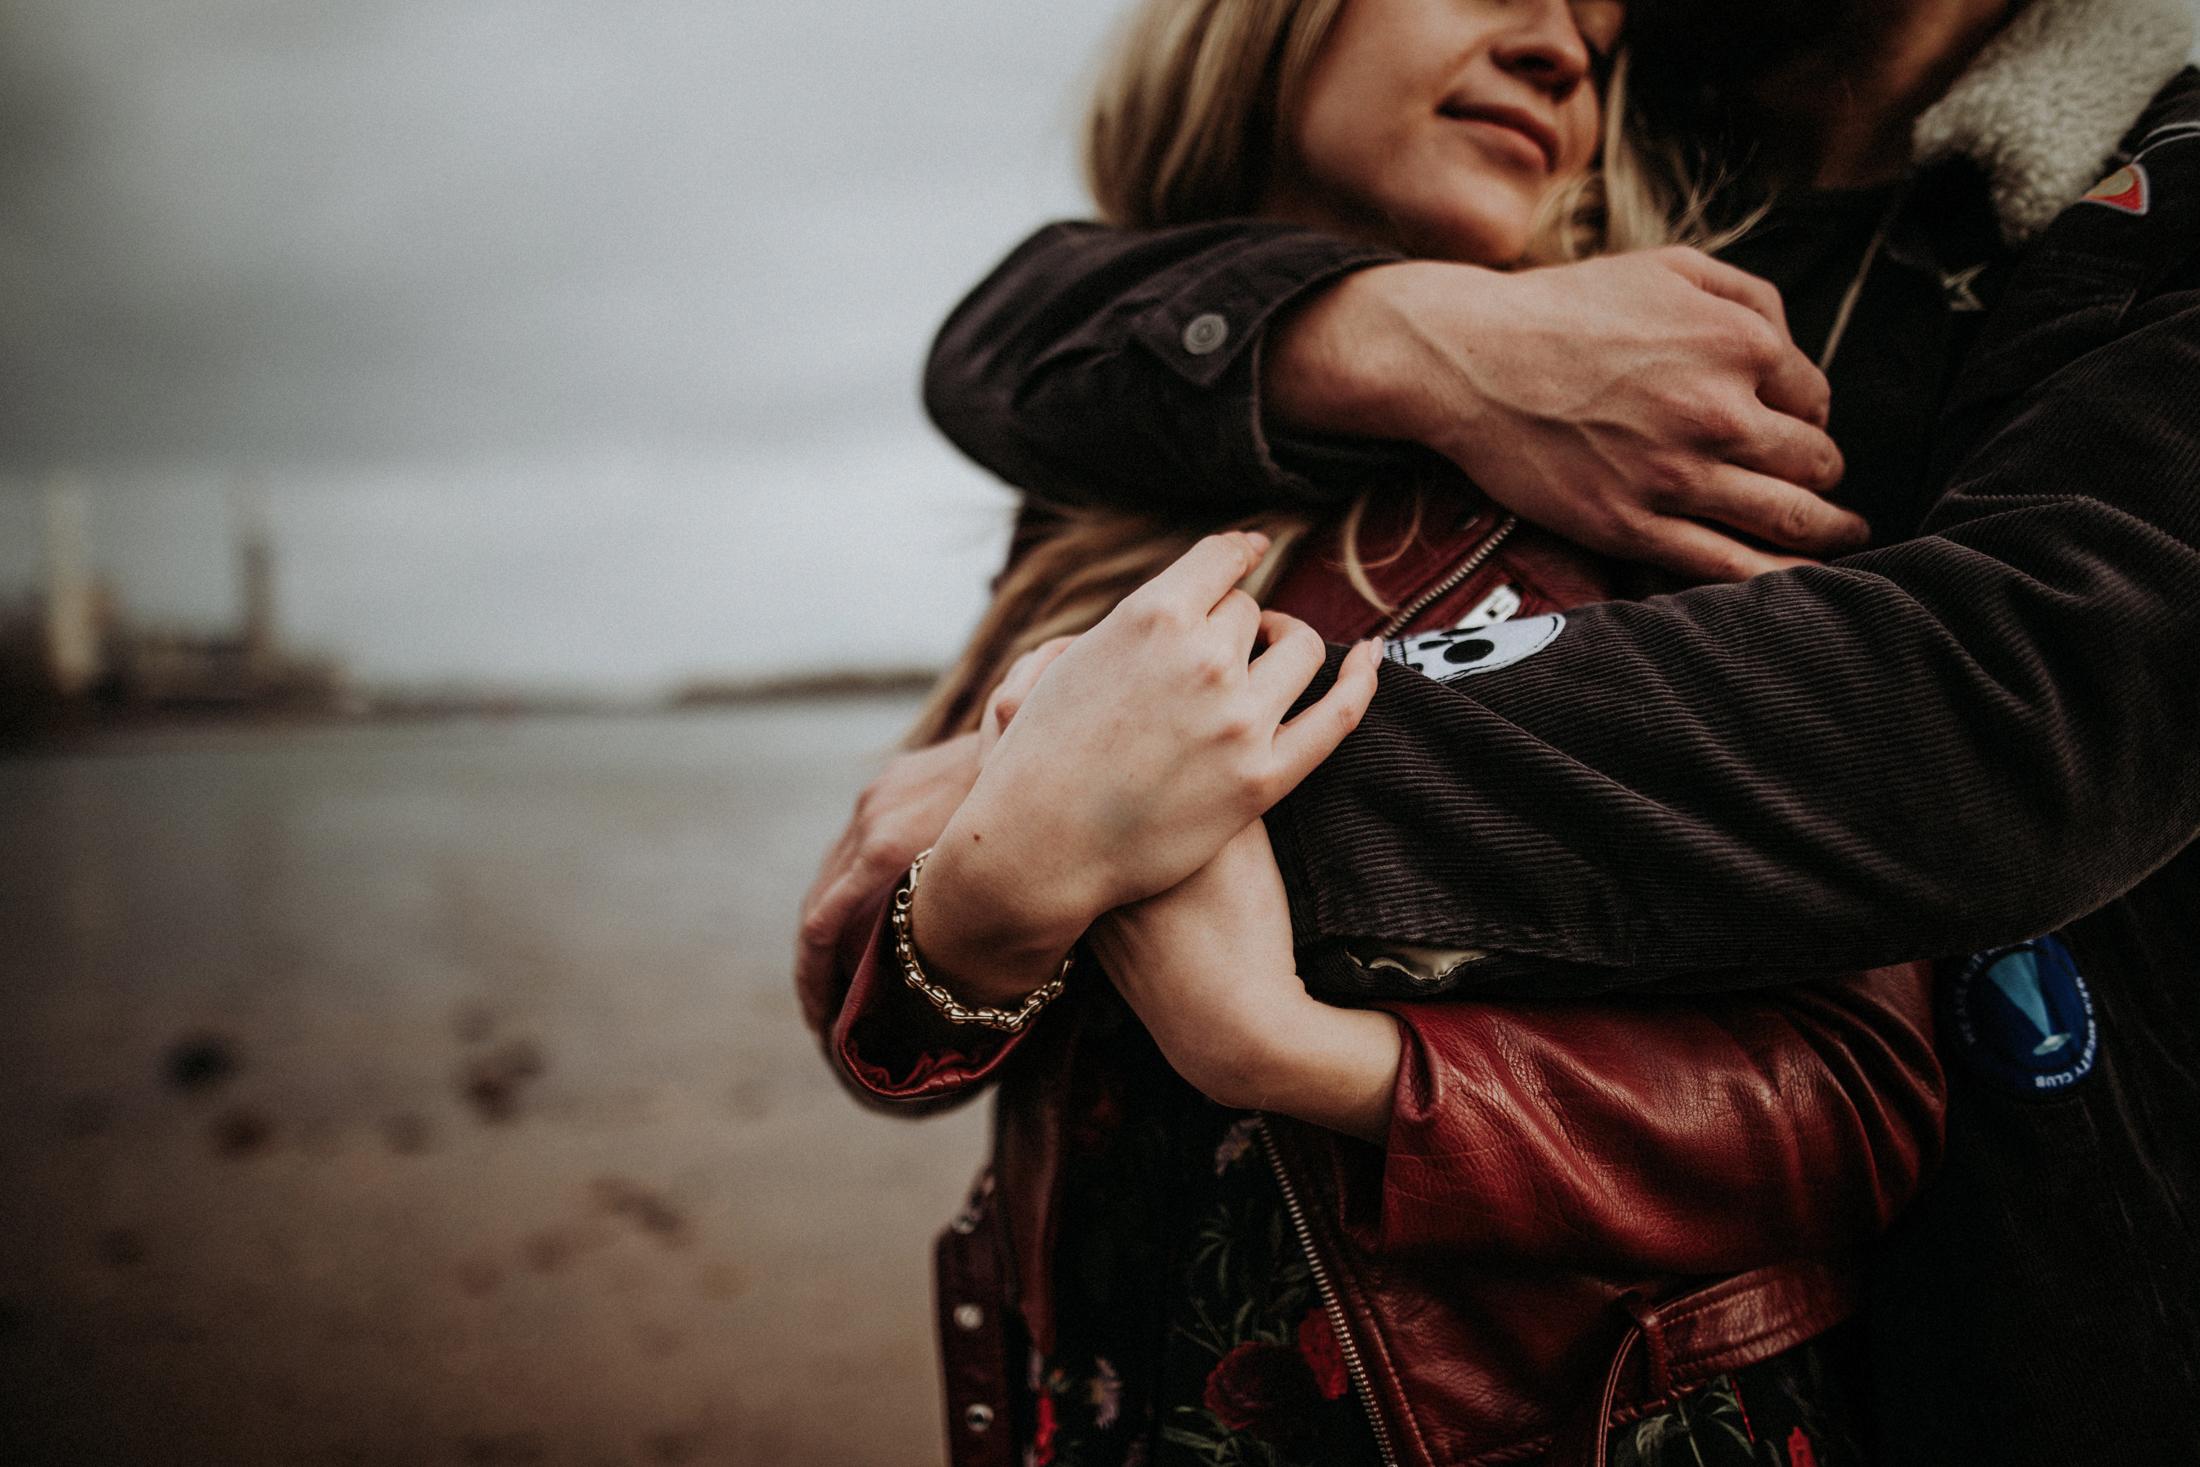 Wedding_Photographer_Mallorca_DanielaMarquardt_Photography_CanaryIslands_Lanzarote_Iceland_Tuscany_Santorini_Portugal_NewYork_Spain_Elopement_Hochzeitsfotograf_CK62